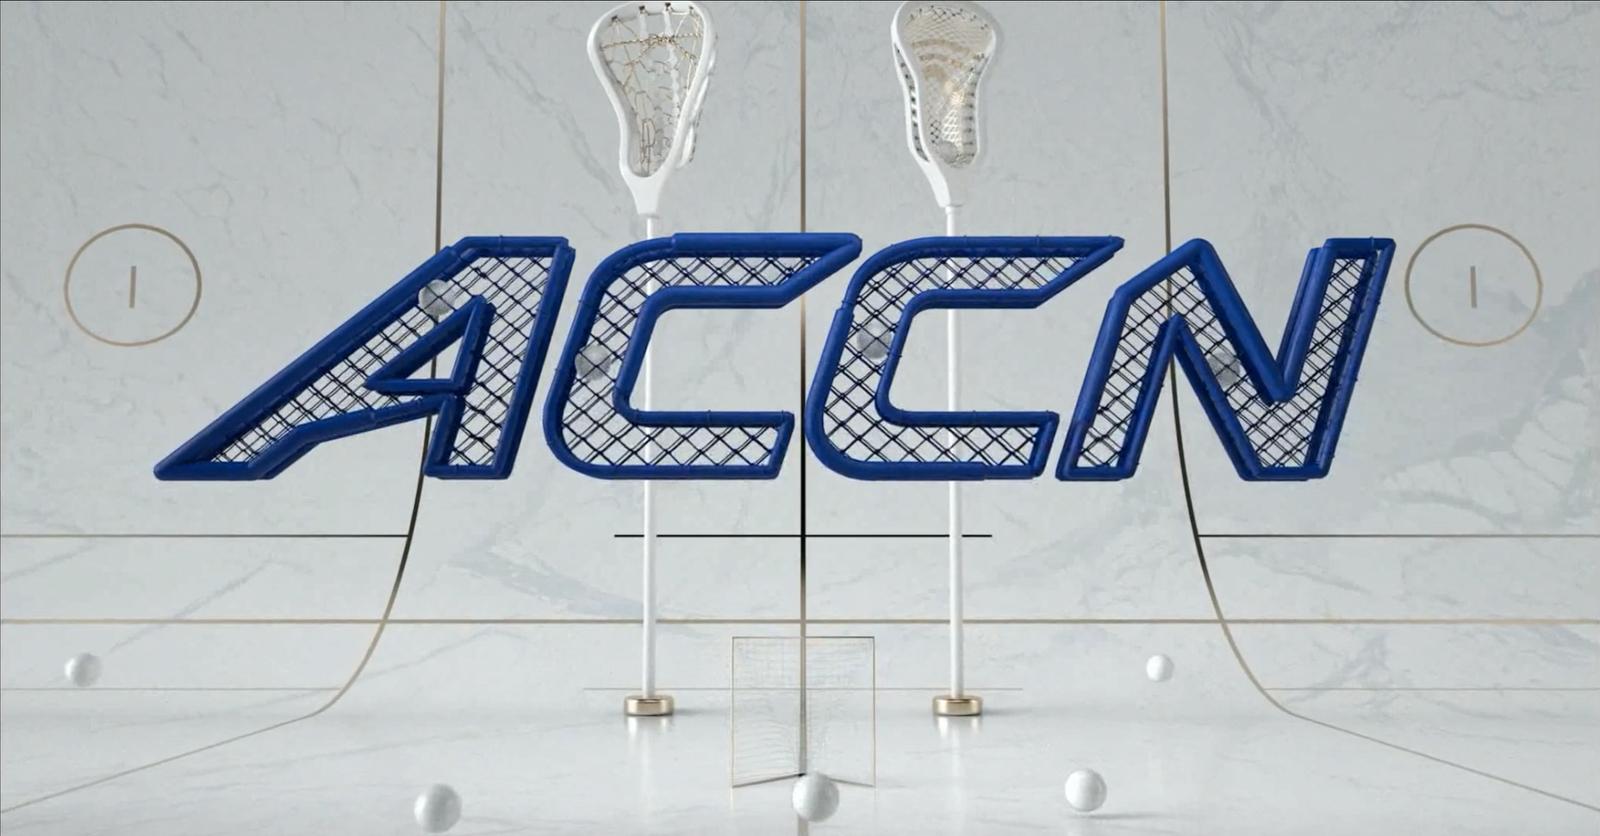 NCS_ACC-Network_Troika_ESPN_037